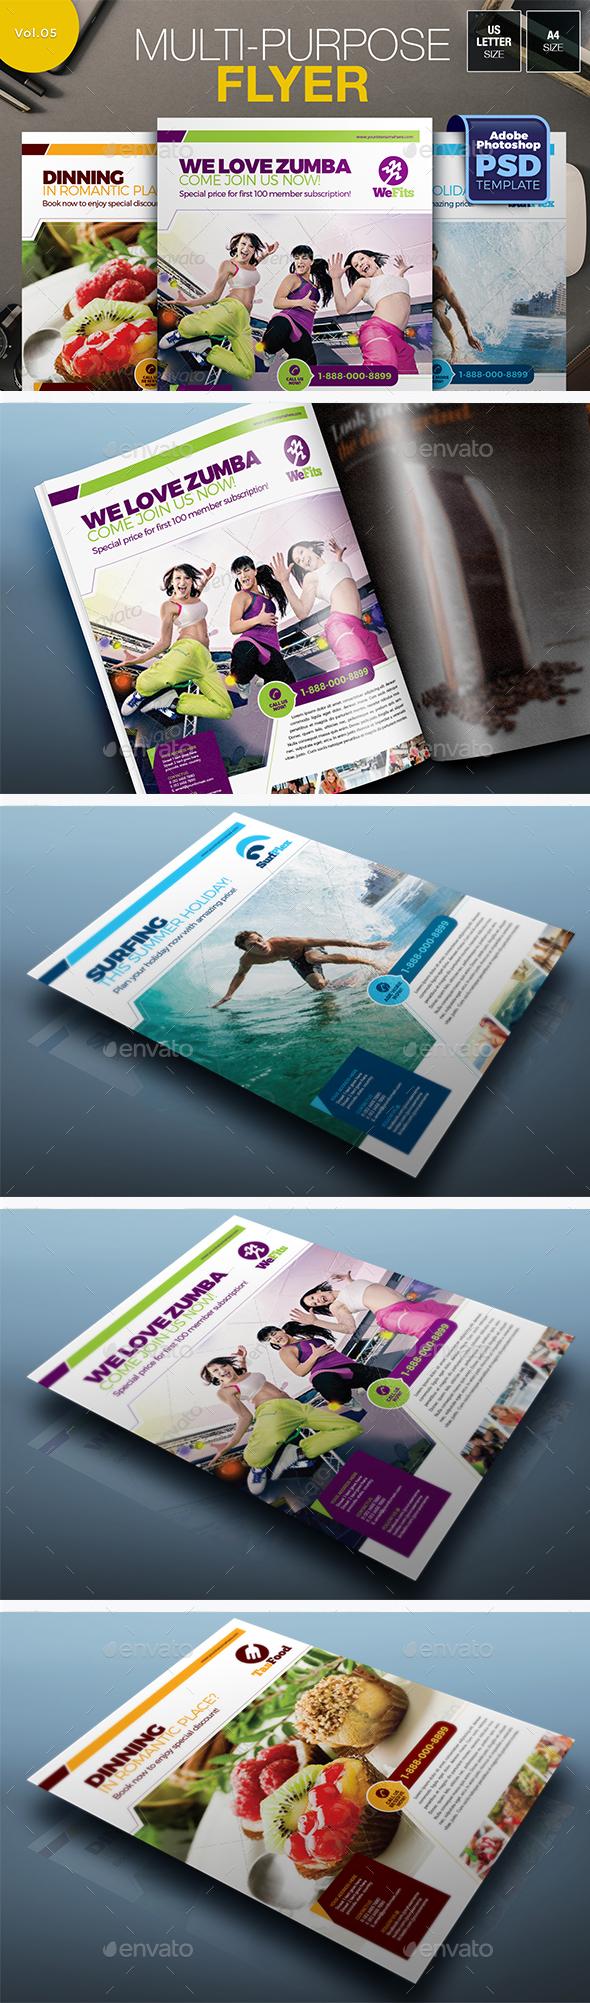 Multipurpose Flyer Vol.05 - Miscellaneous Events